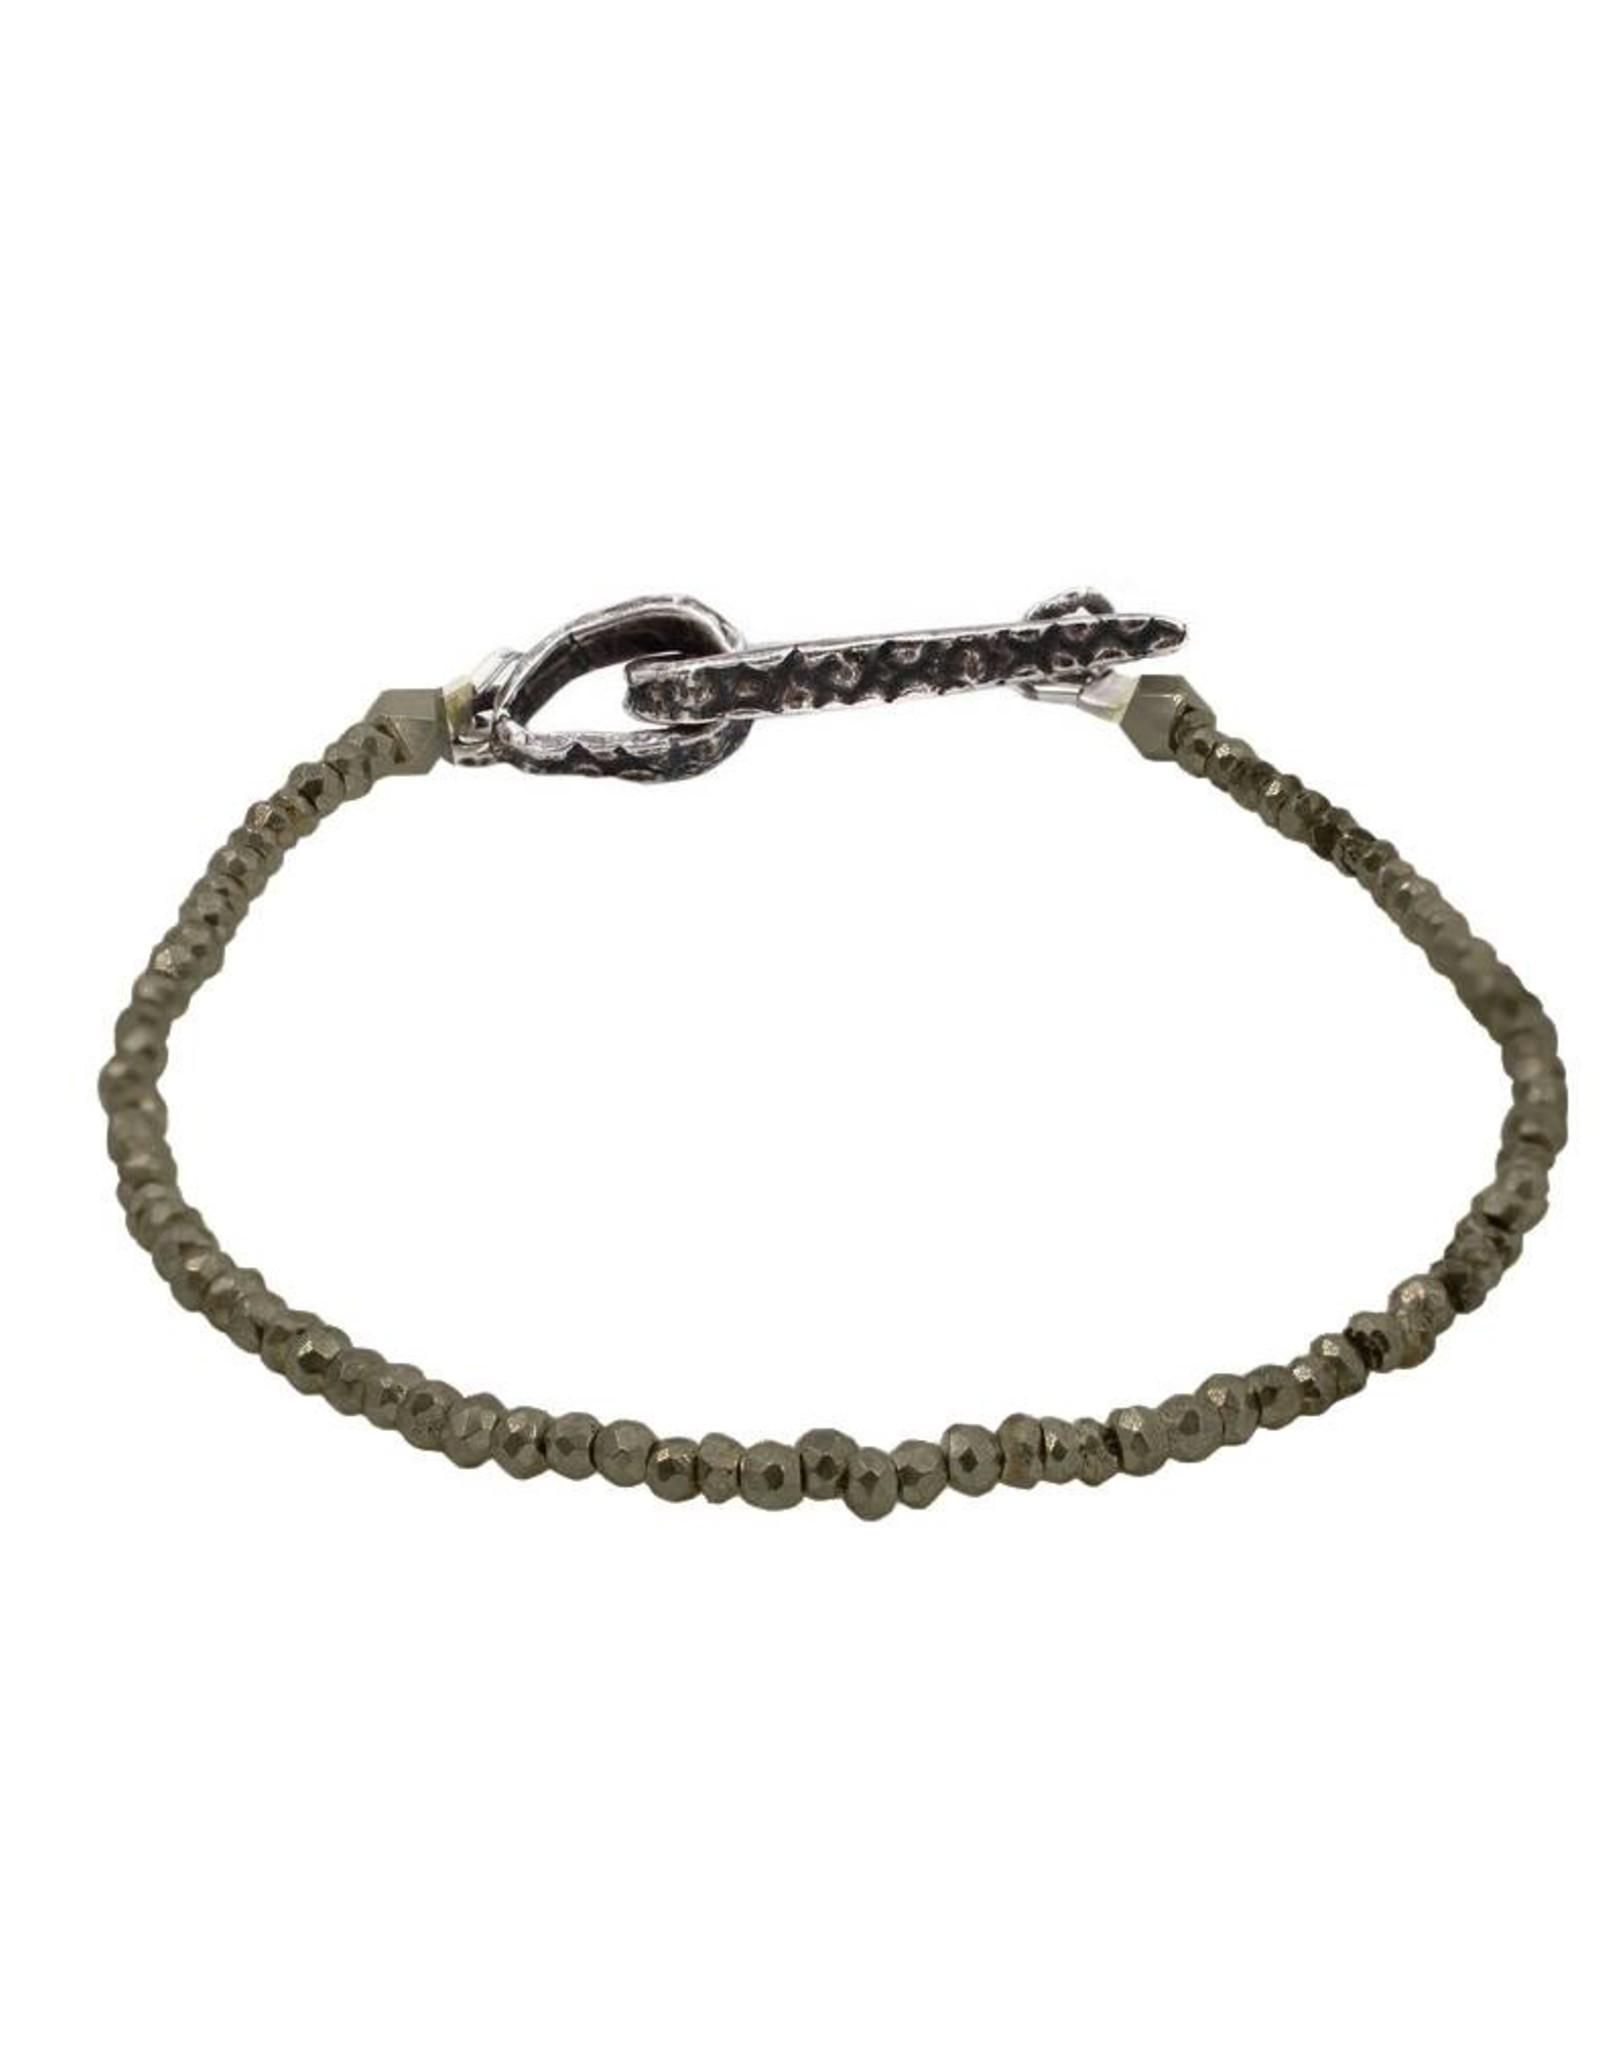 Lauren Wolf Jewelry Strand Bracelet - Pyrite